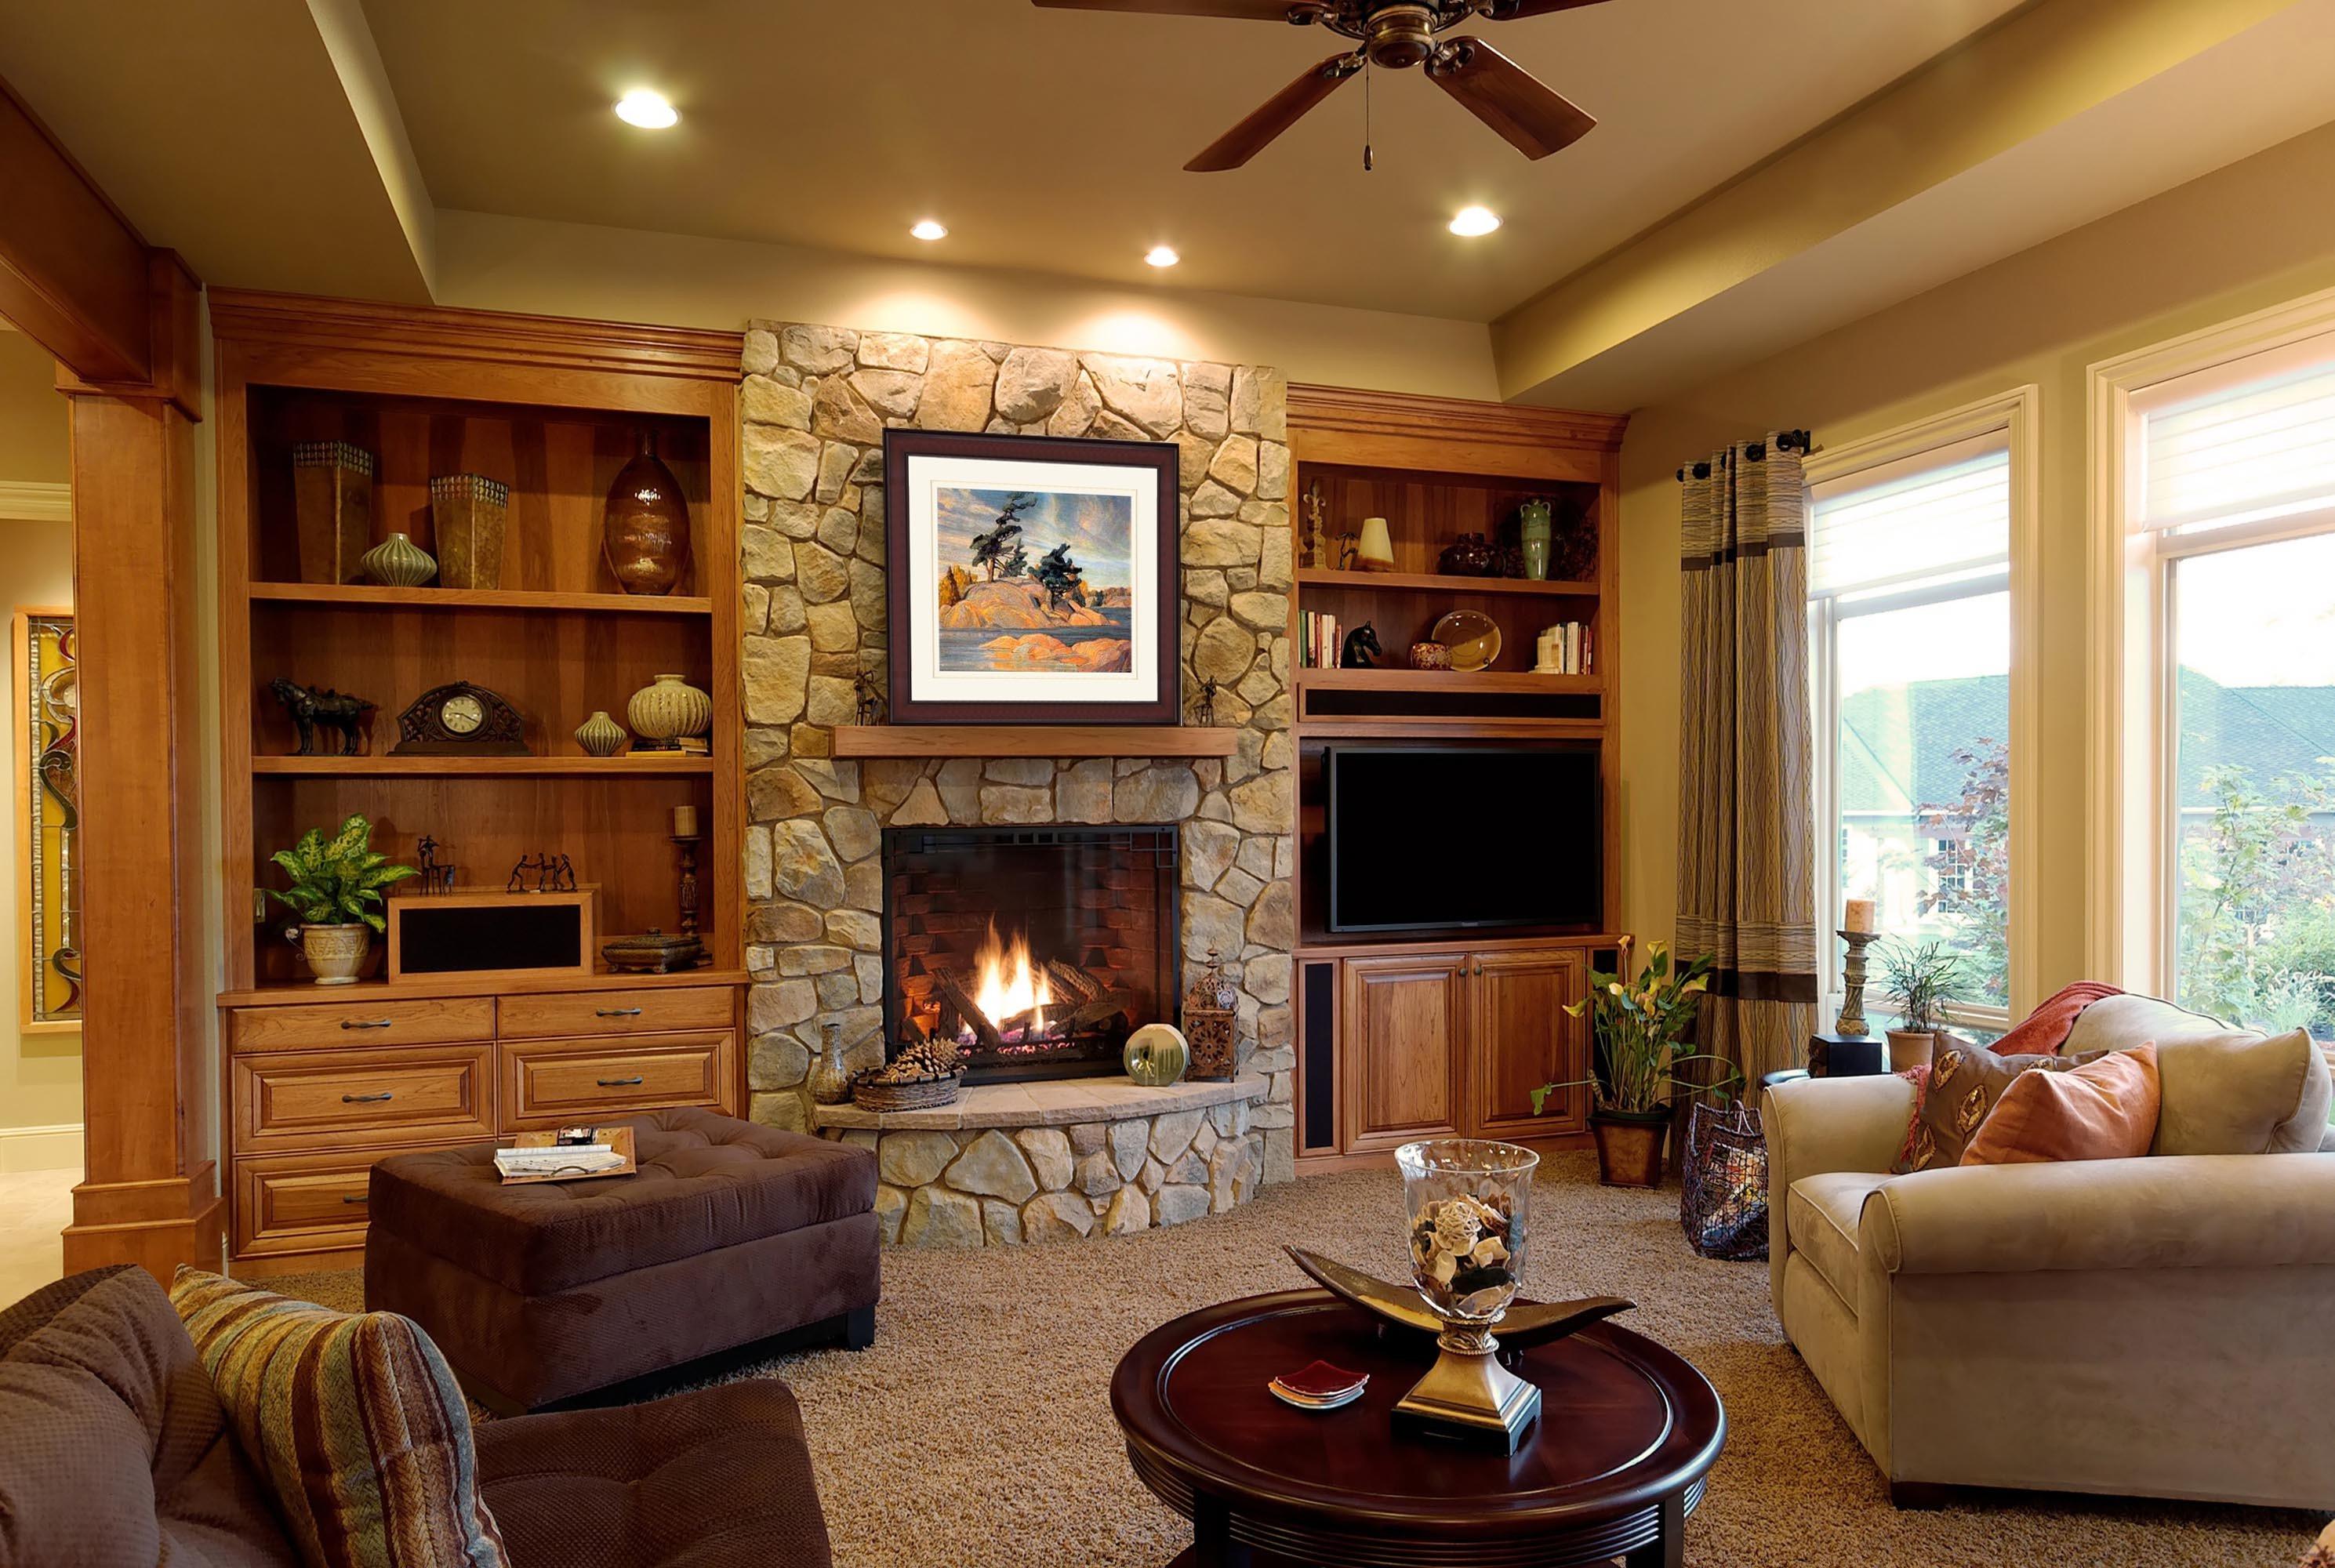 Living Room Decor with Fireplace Luxury Cozy Living Room Ideas Homeideasblog